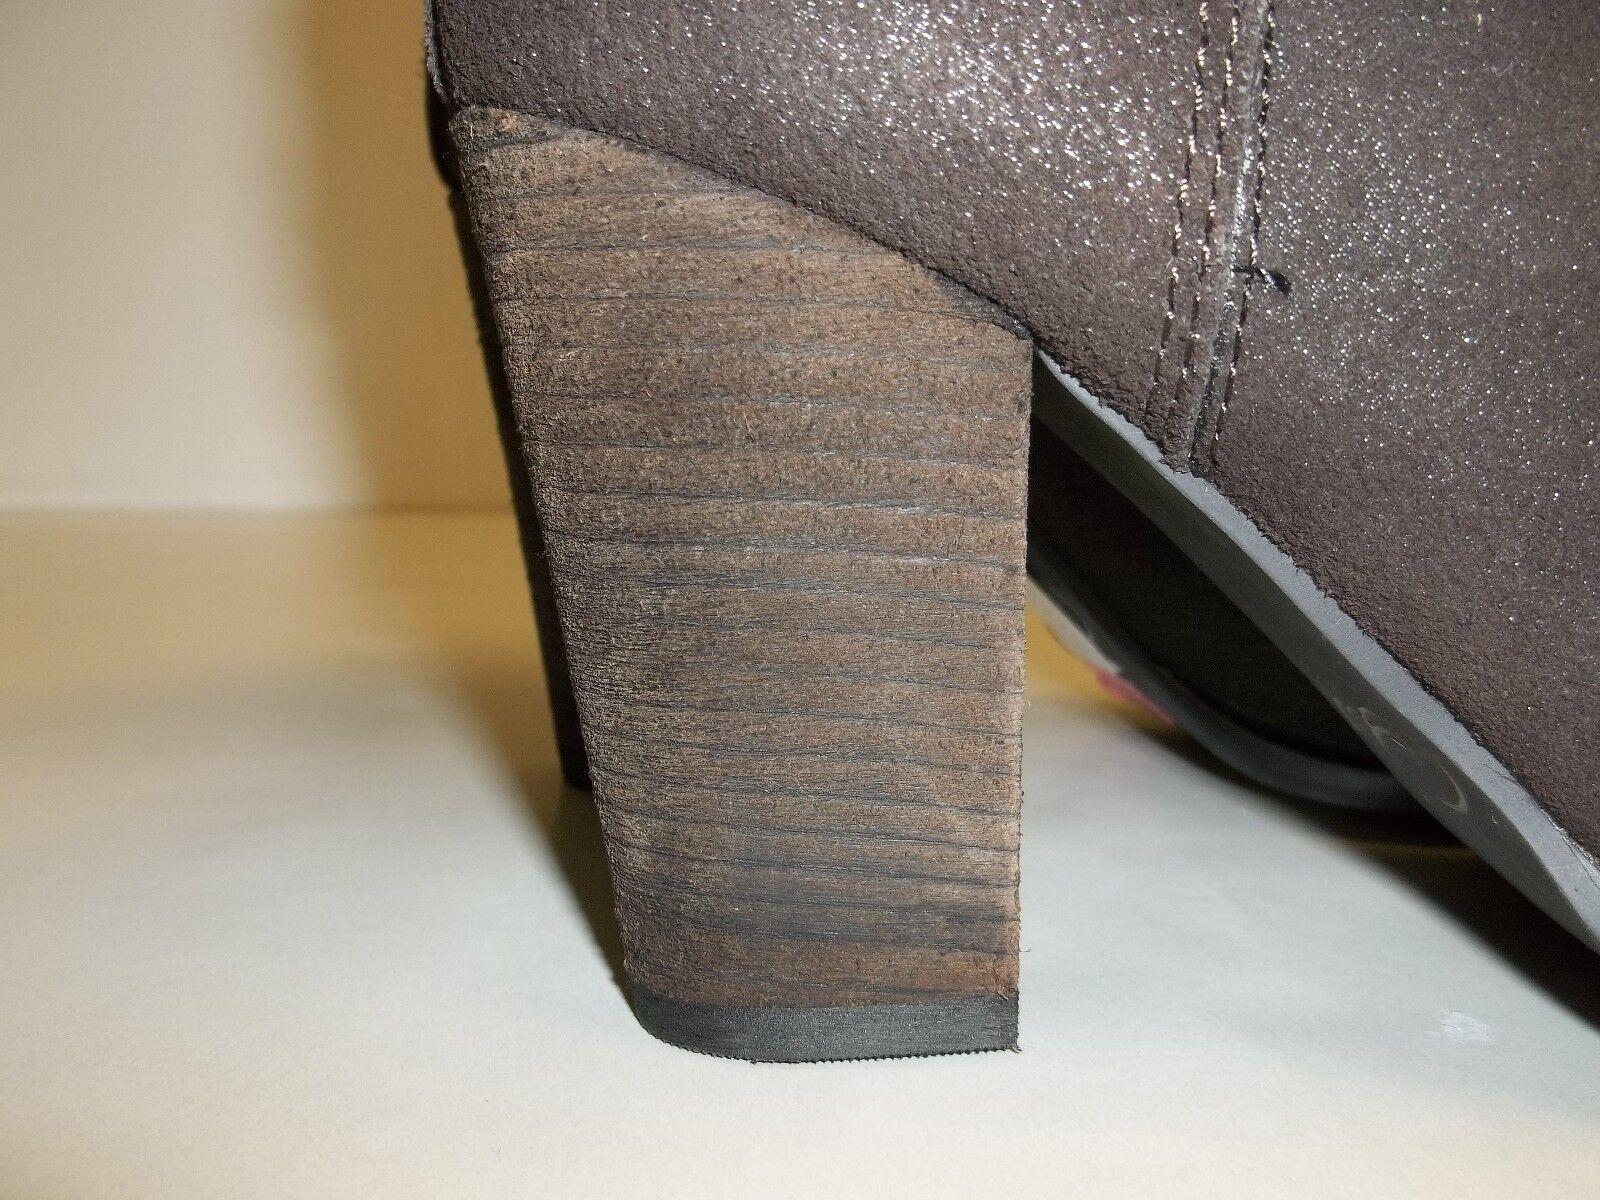 Reba Braun Größe 10 M ZANIA Braun Reba Leder Ankle Stiefel New Damenschuhe Schuhes 11e17d